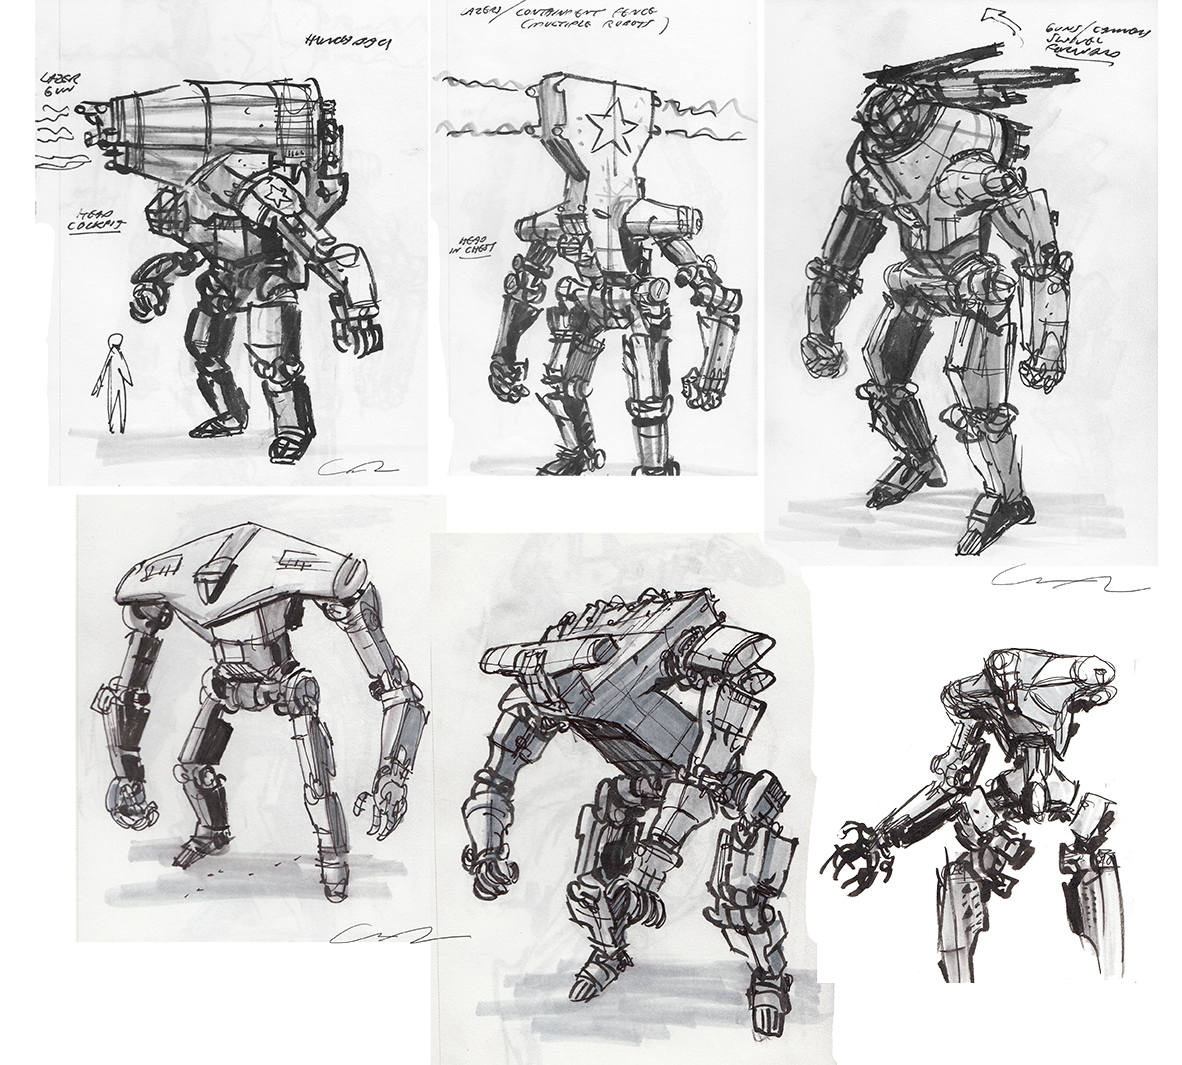 Image - Jaeger Concept Art 02.png - Pacific Rim Wiki Pacific Rim Concept Art